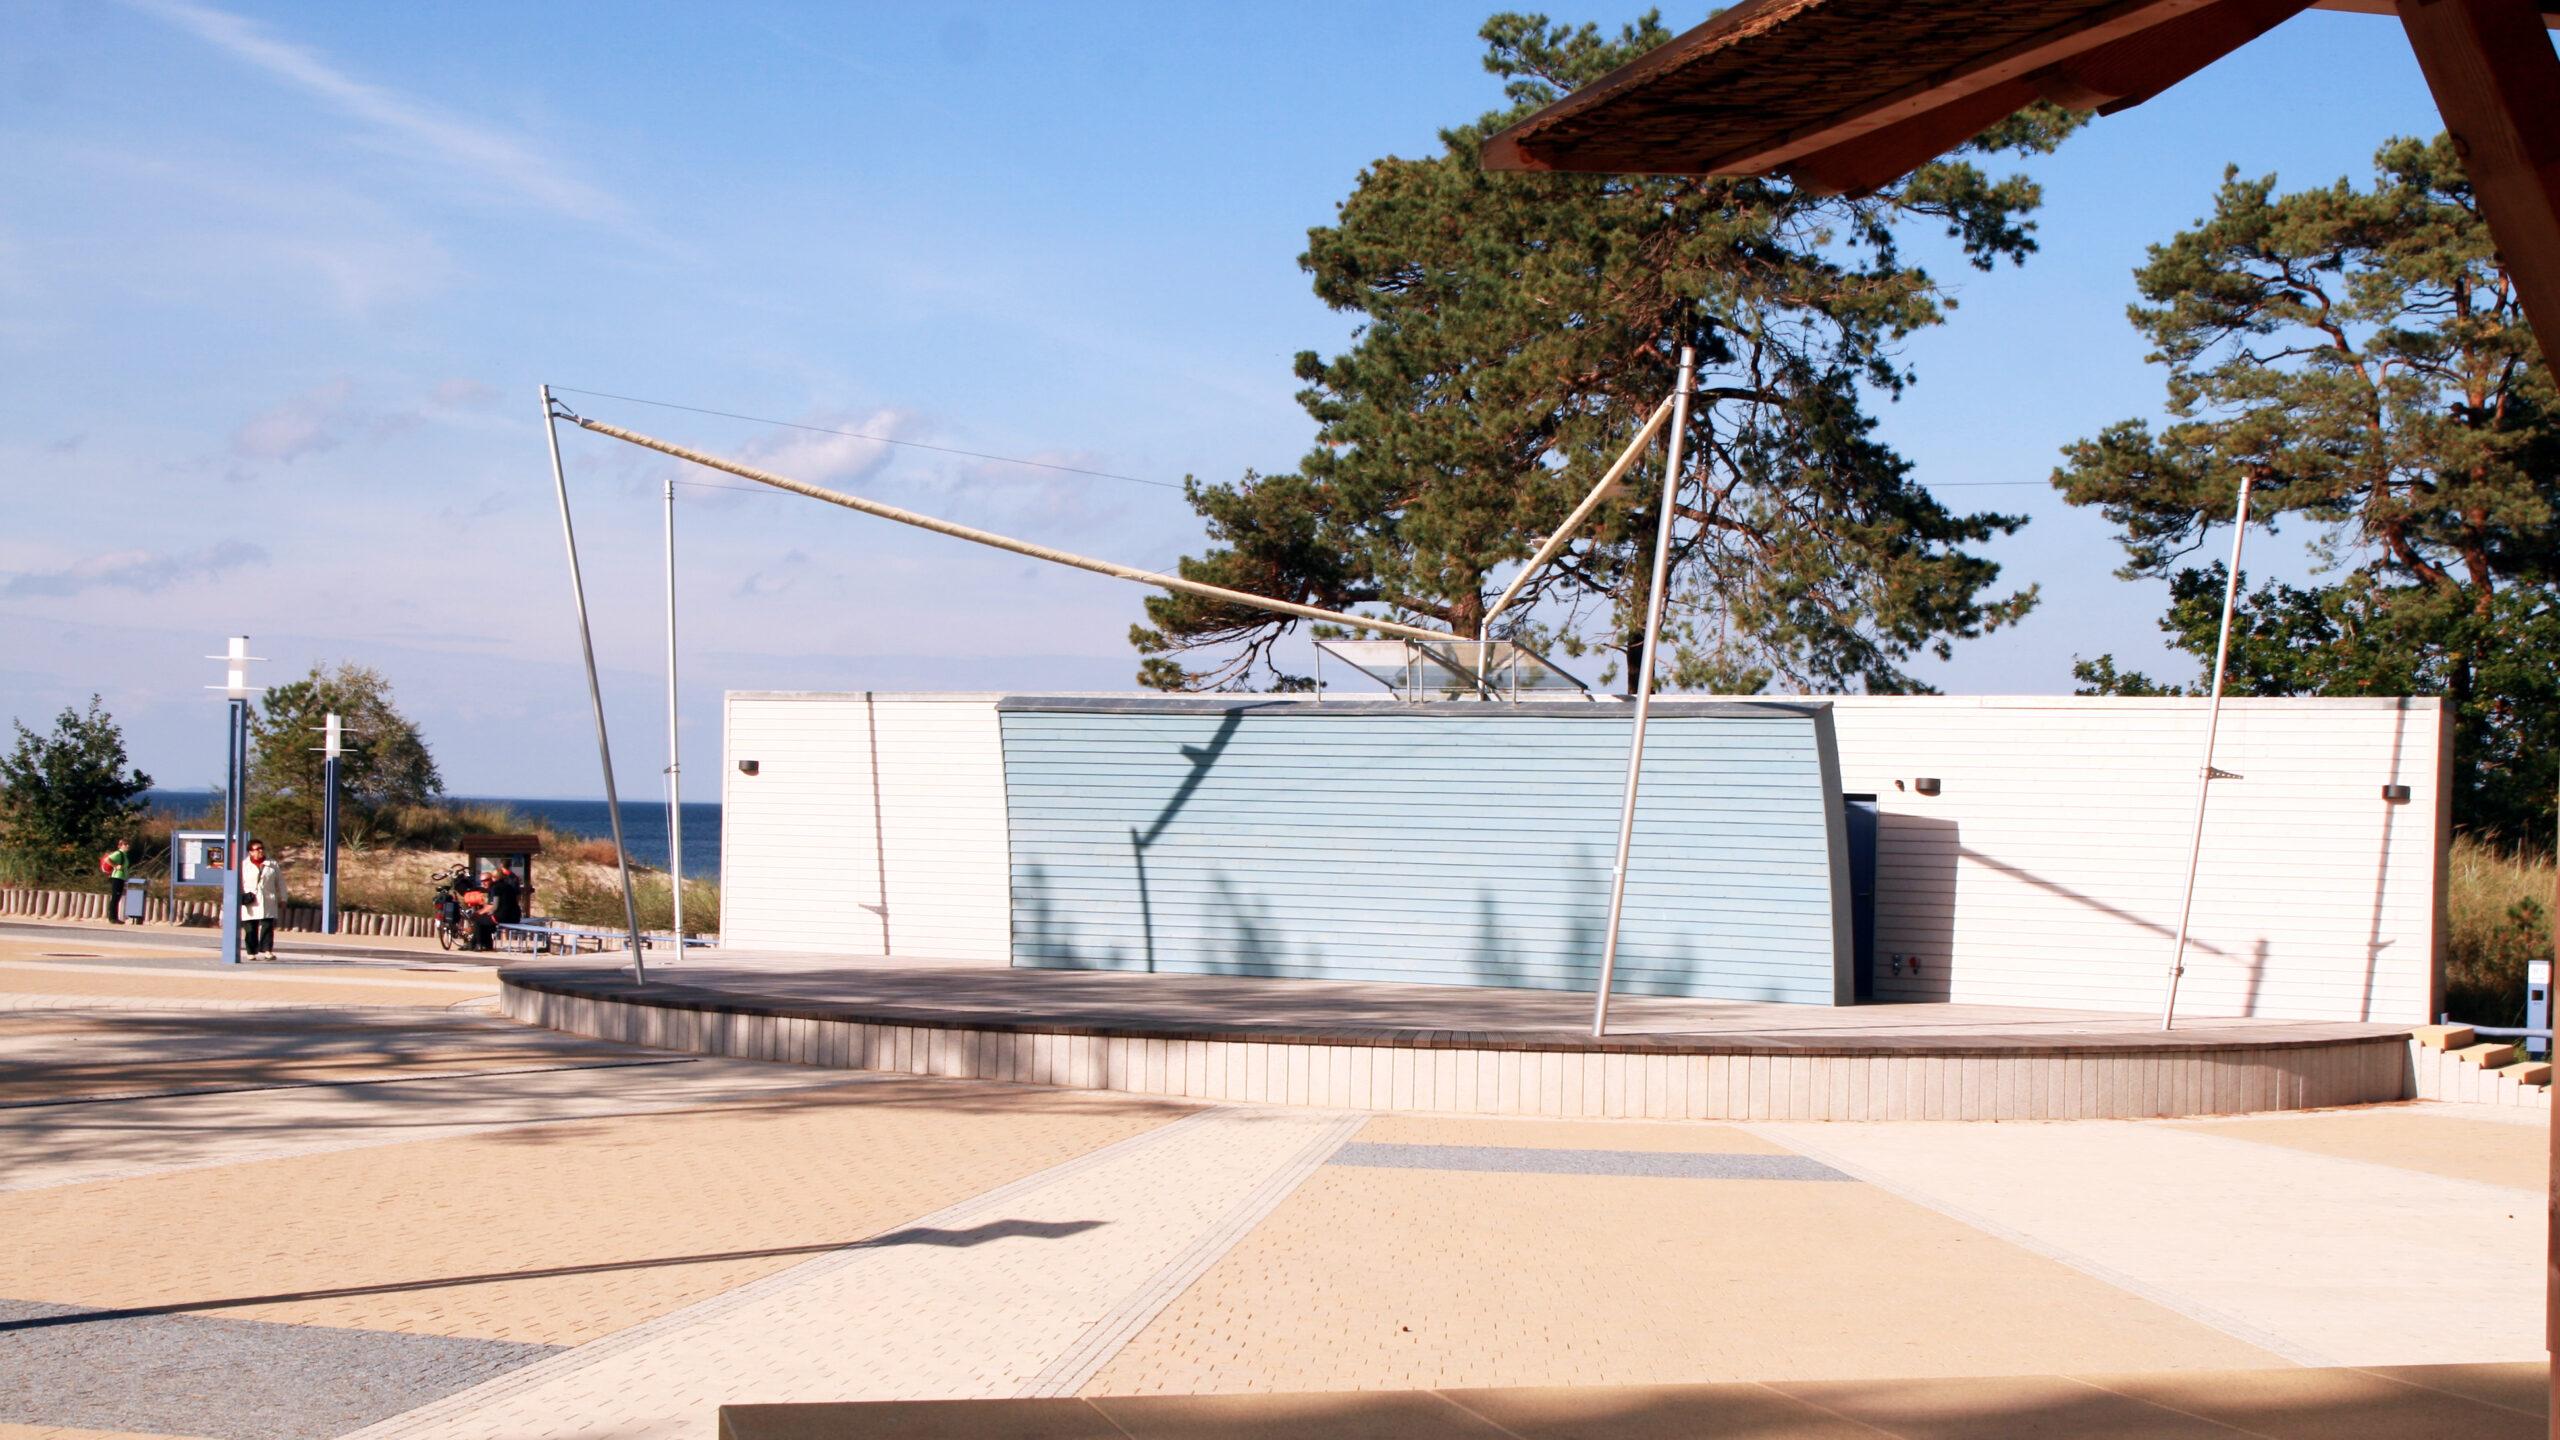 Strandpromenade Festplatz Zempin Insel Usedom Ausflugsziel Erholung Urlaub